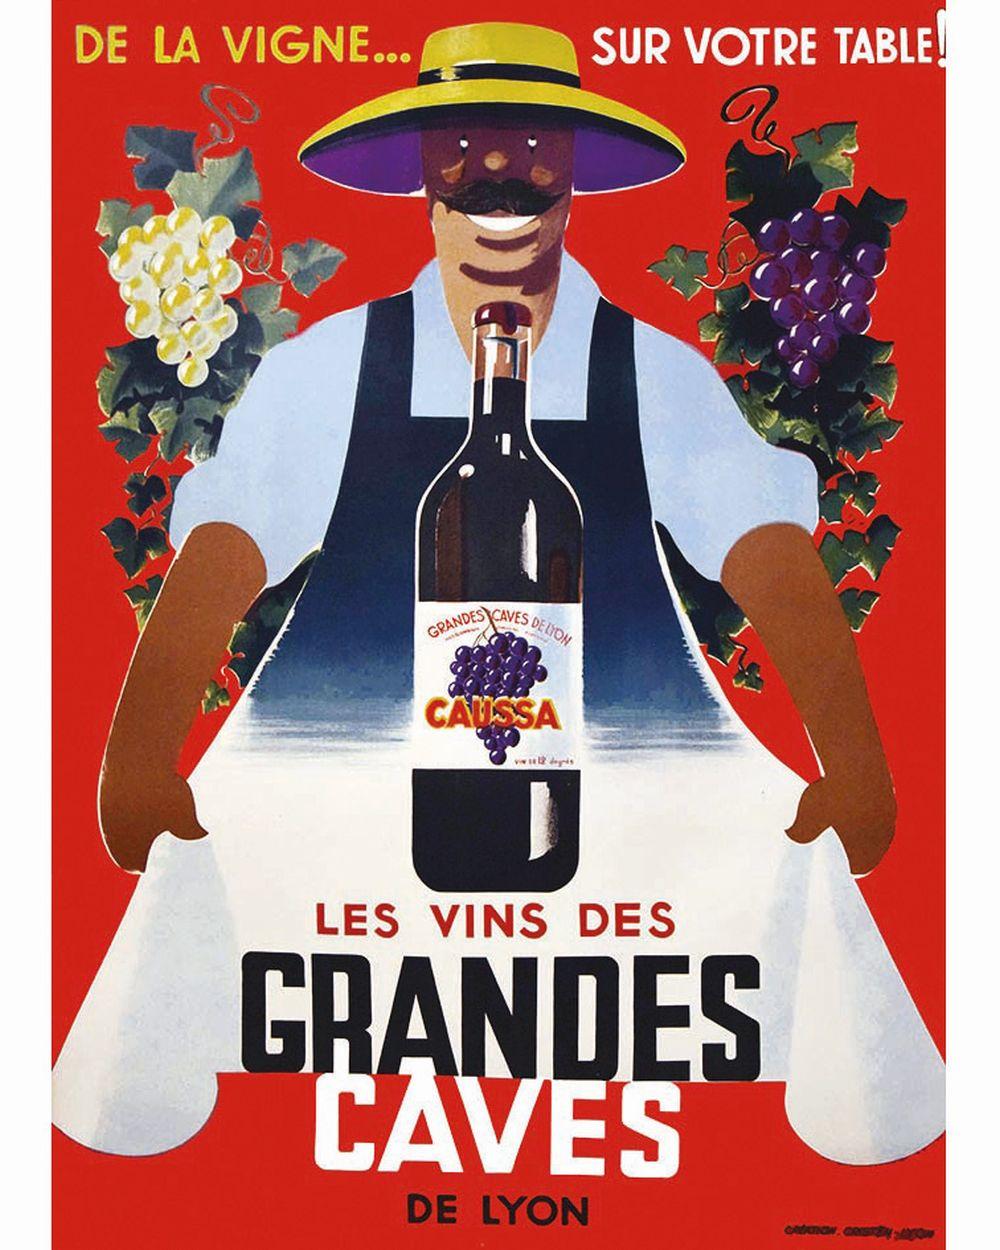 Grandes Caves de Lyon Les Vins     vesr 1930  Lyon (Rhône)